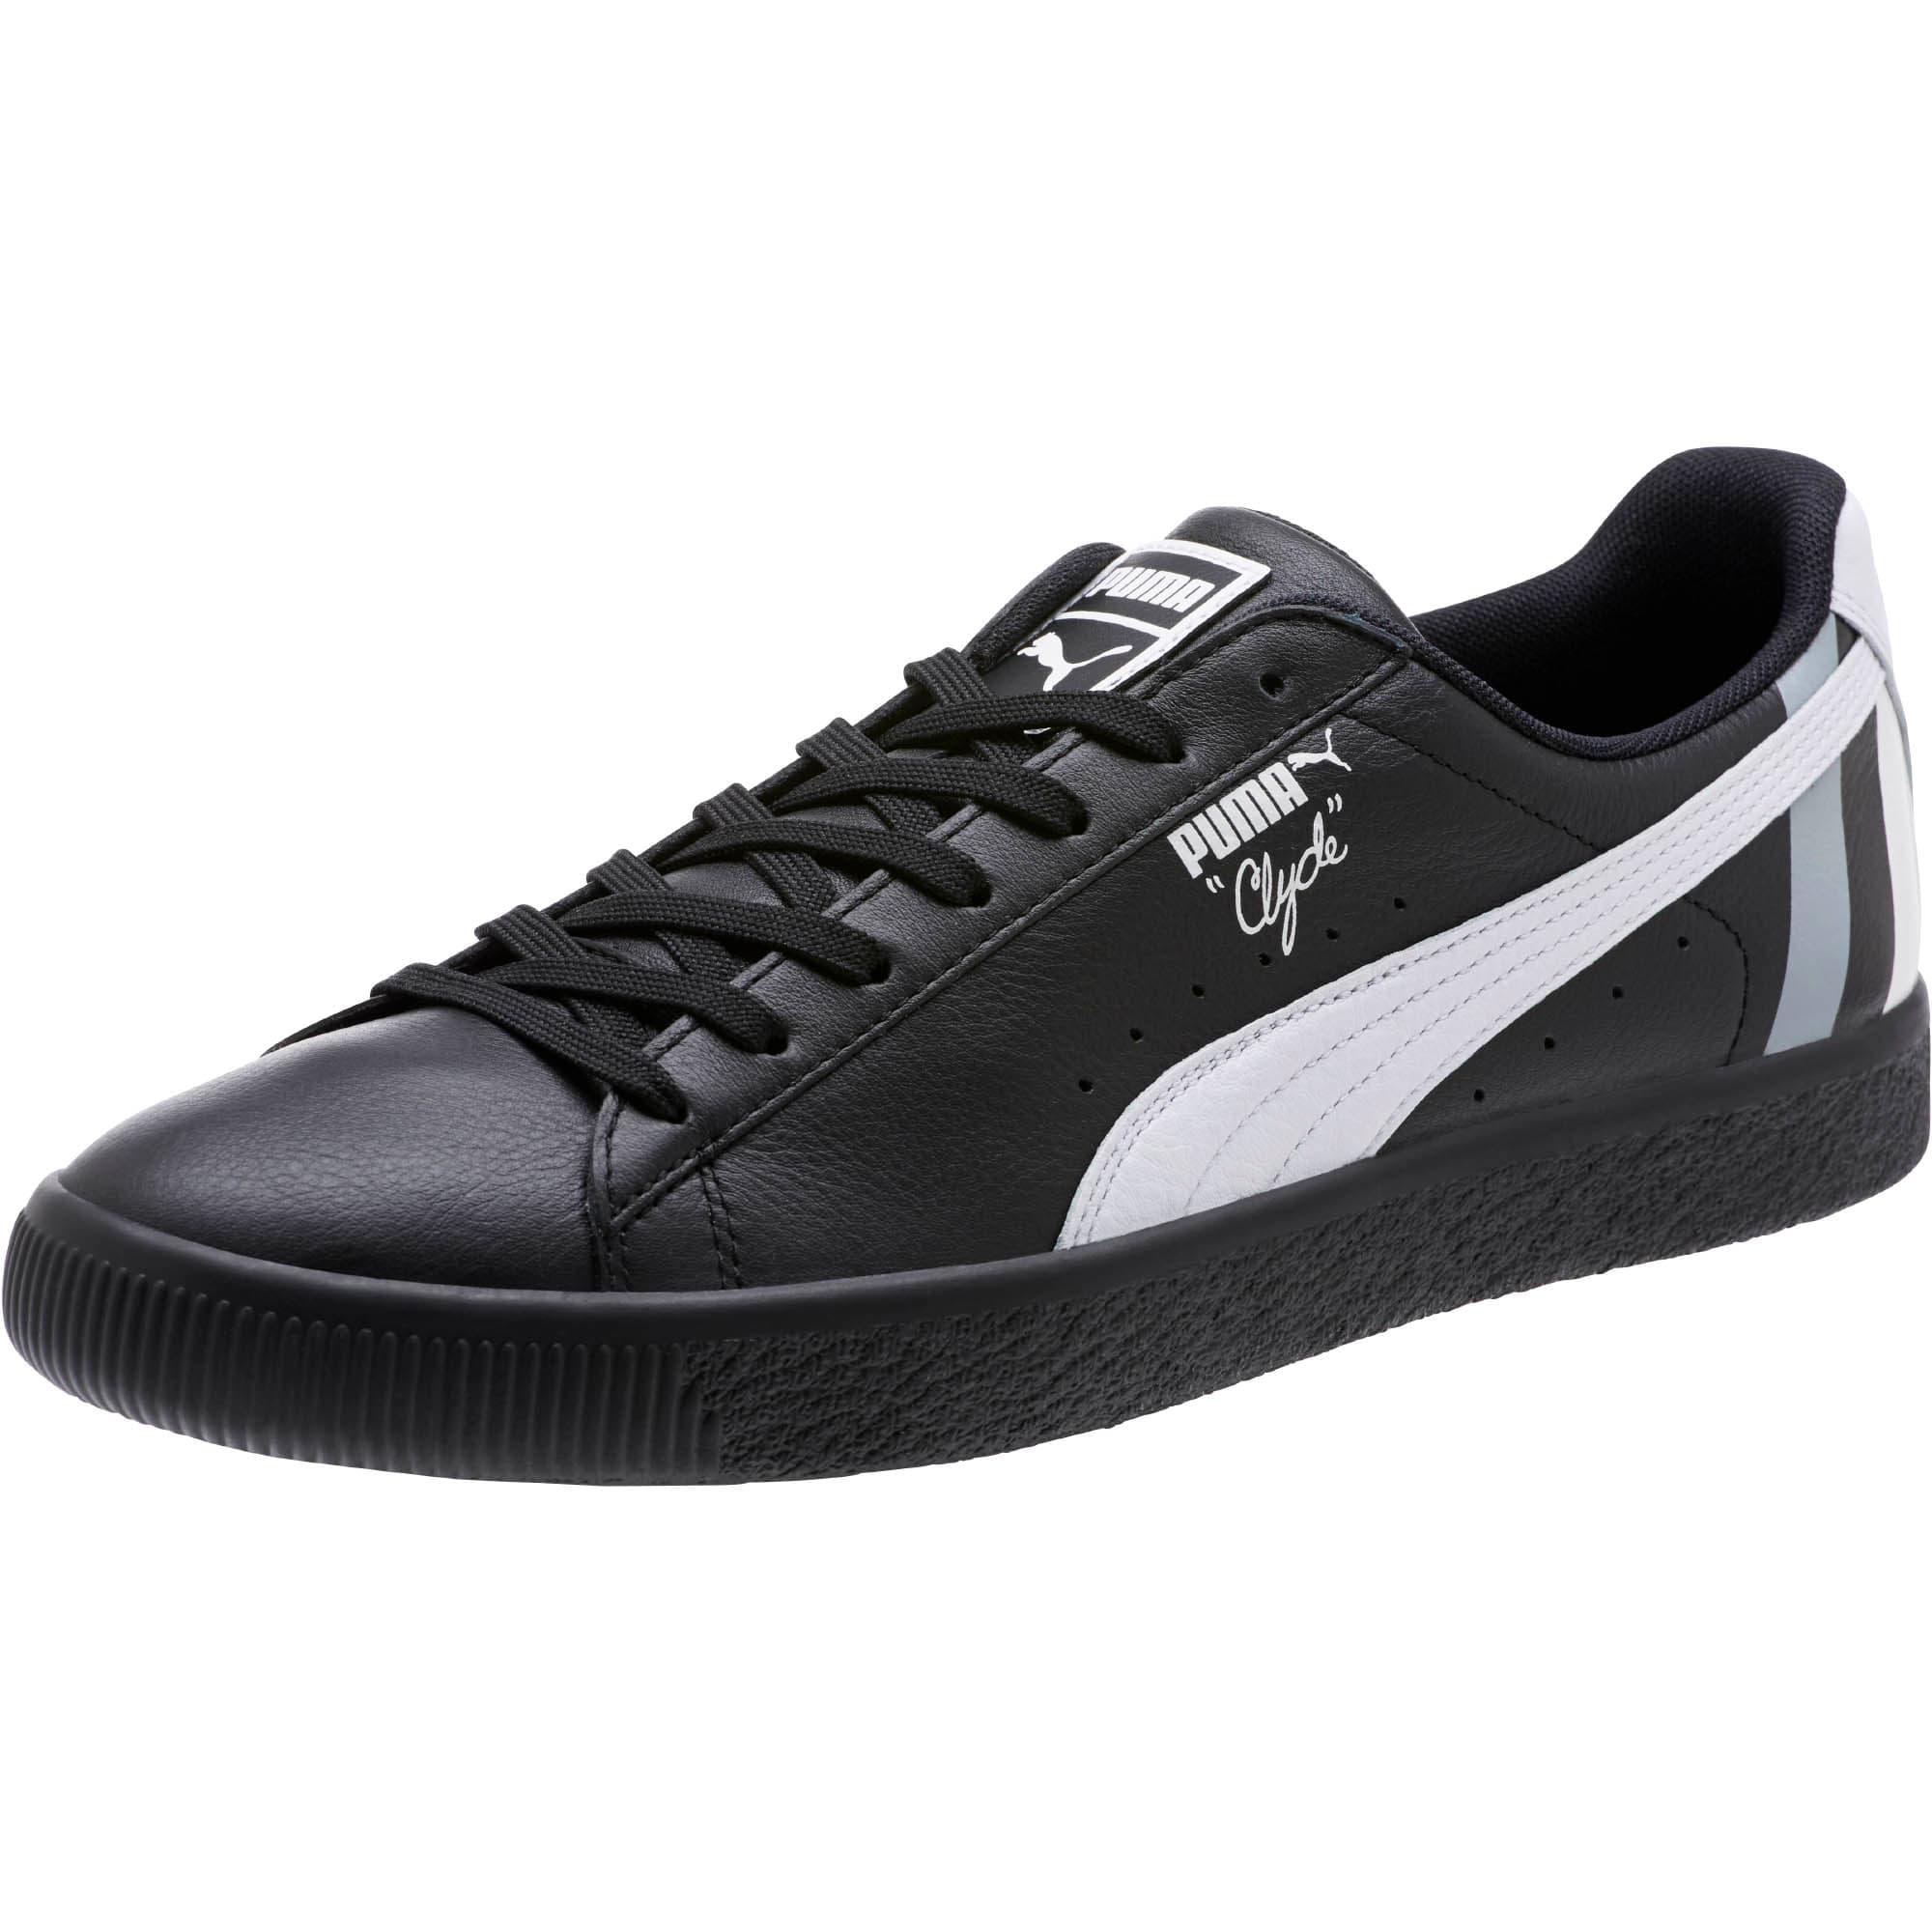 Clyde Stripes Men's Sneakers